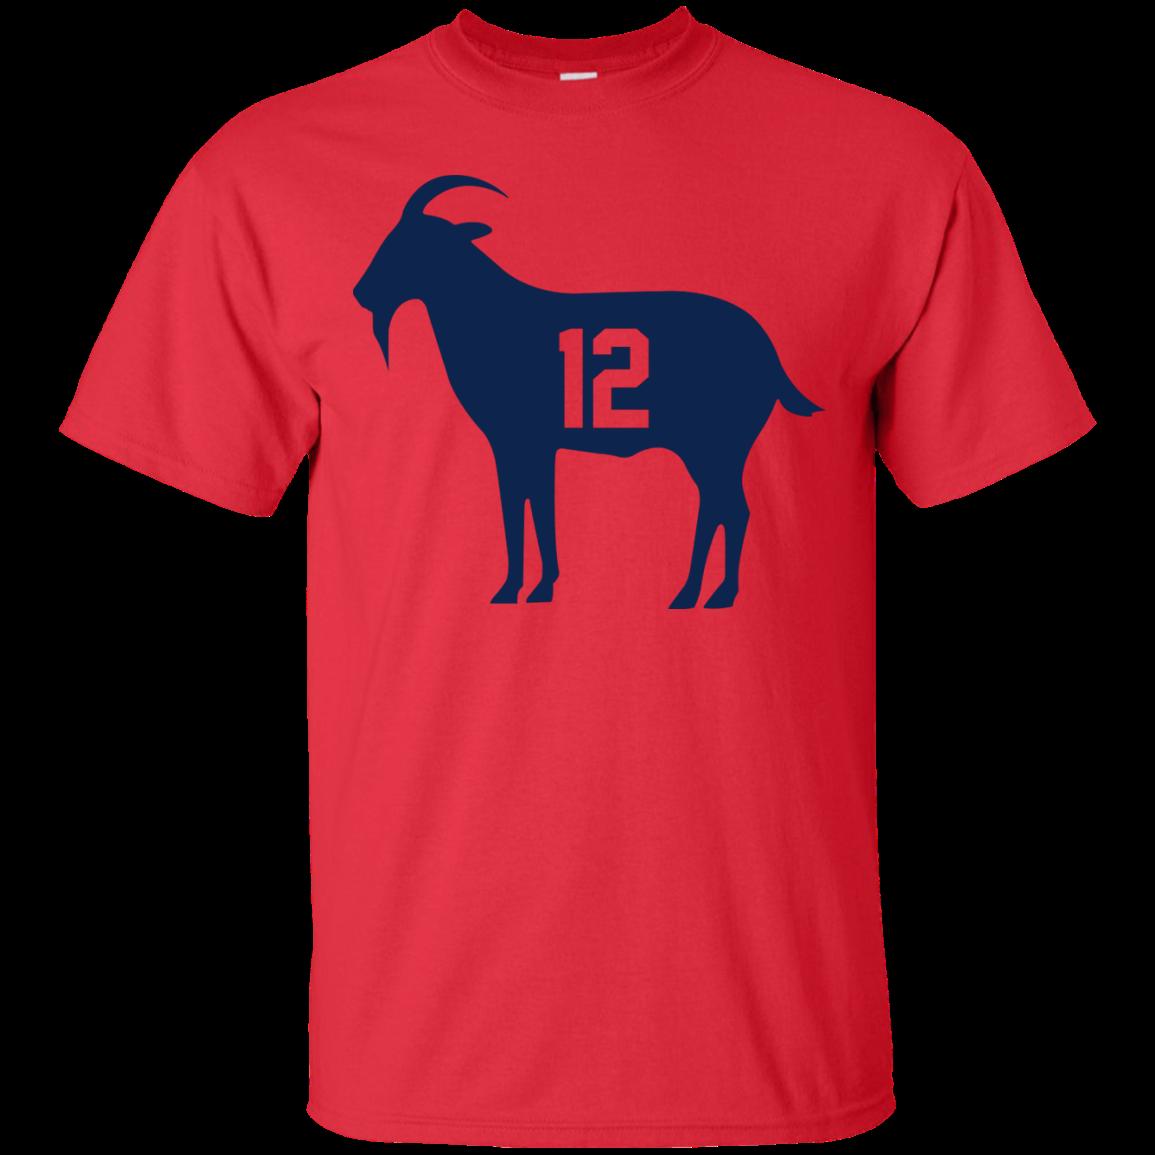 image 75px Goat Tb 12 Tom Brady T Shirt, Hoodies, Tank Top